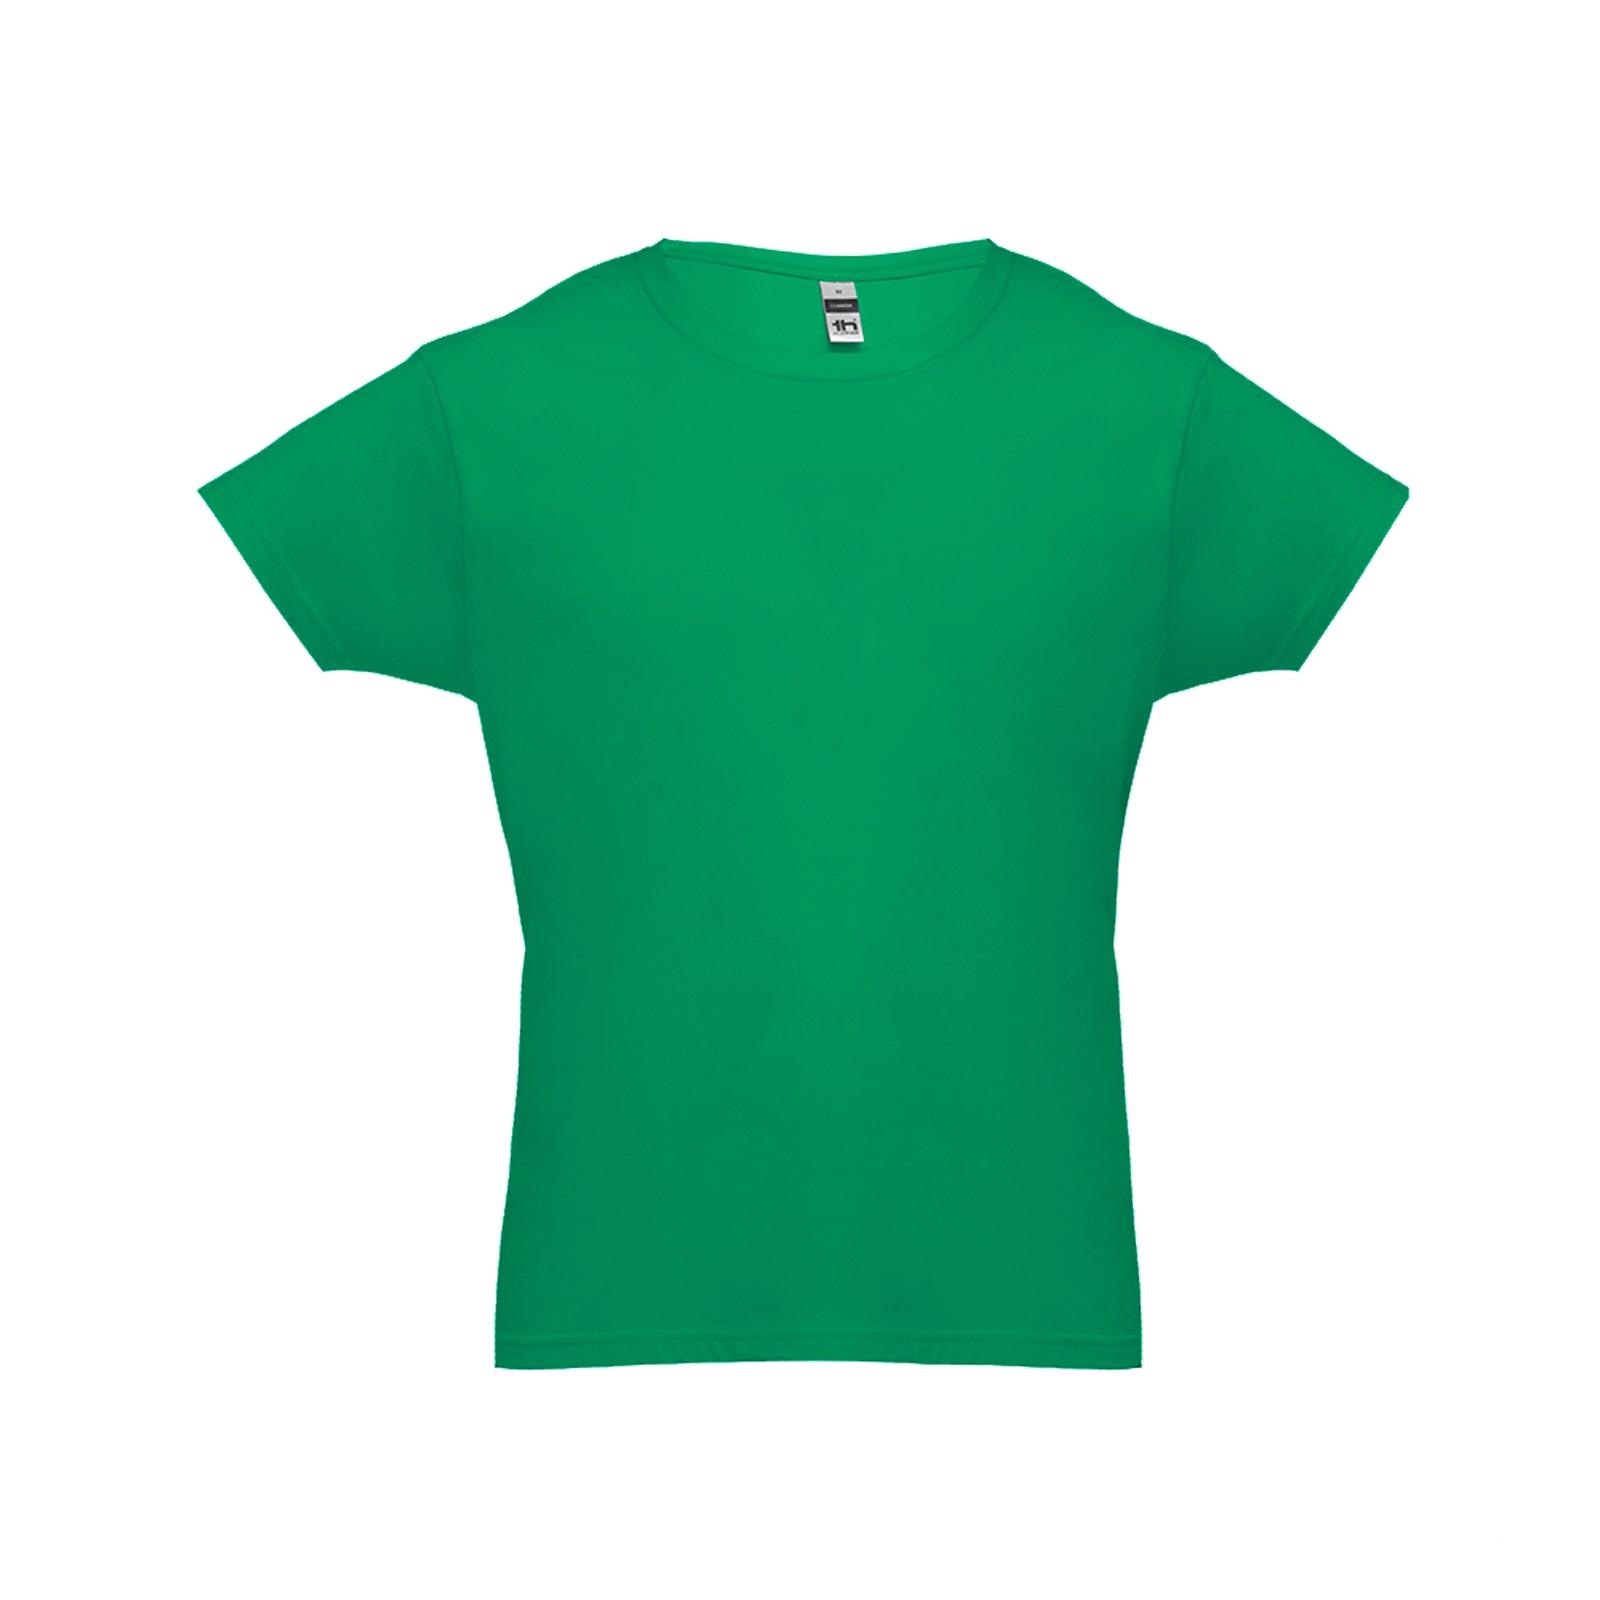 LUANDA. Men's t-shirt - Green / XXL